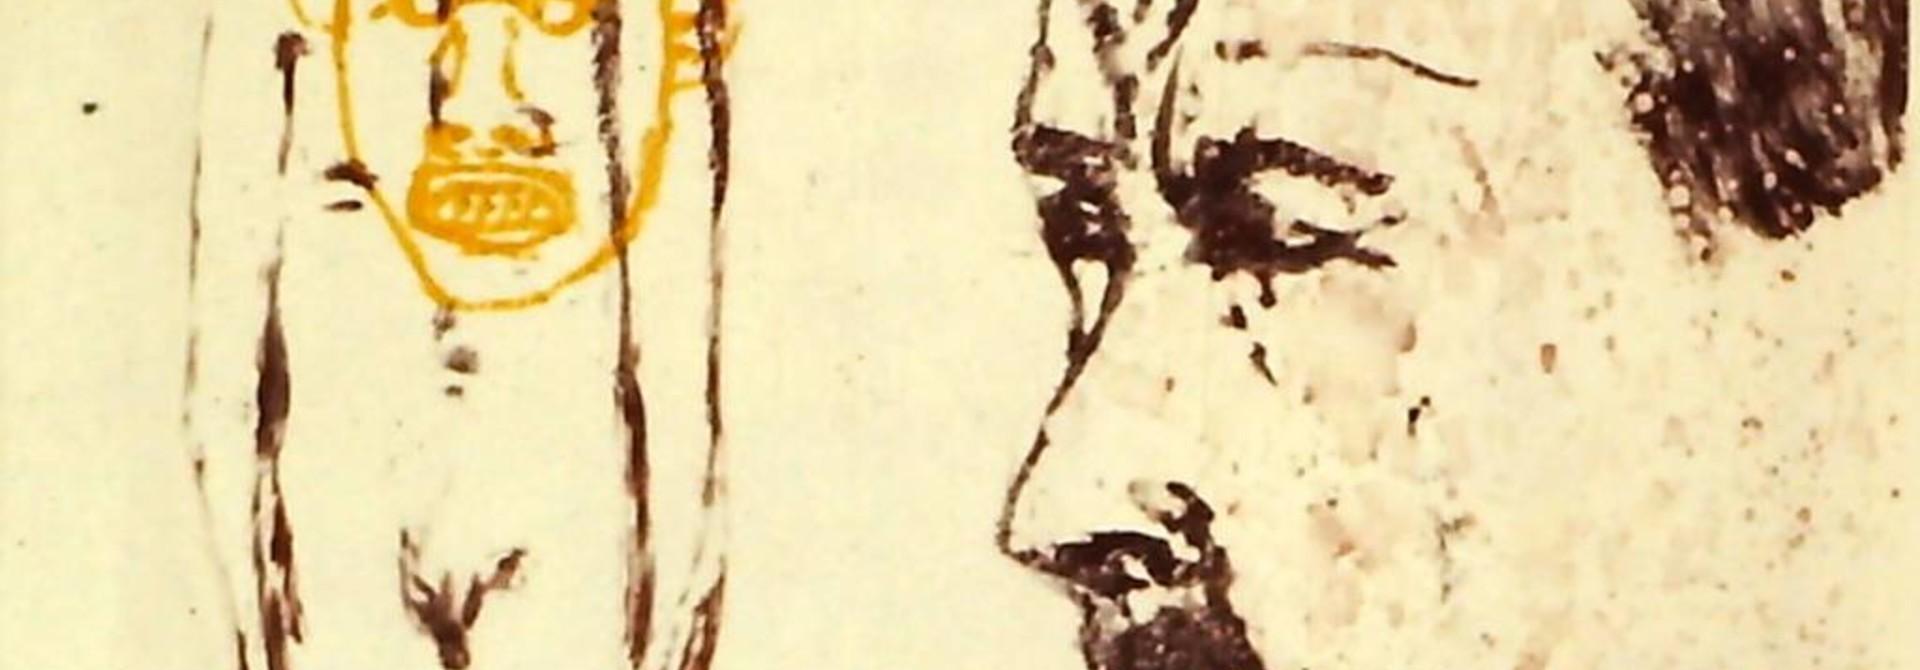 untitled (23/23 Monotypes)